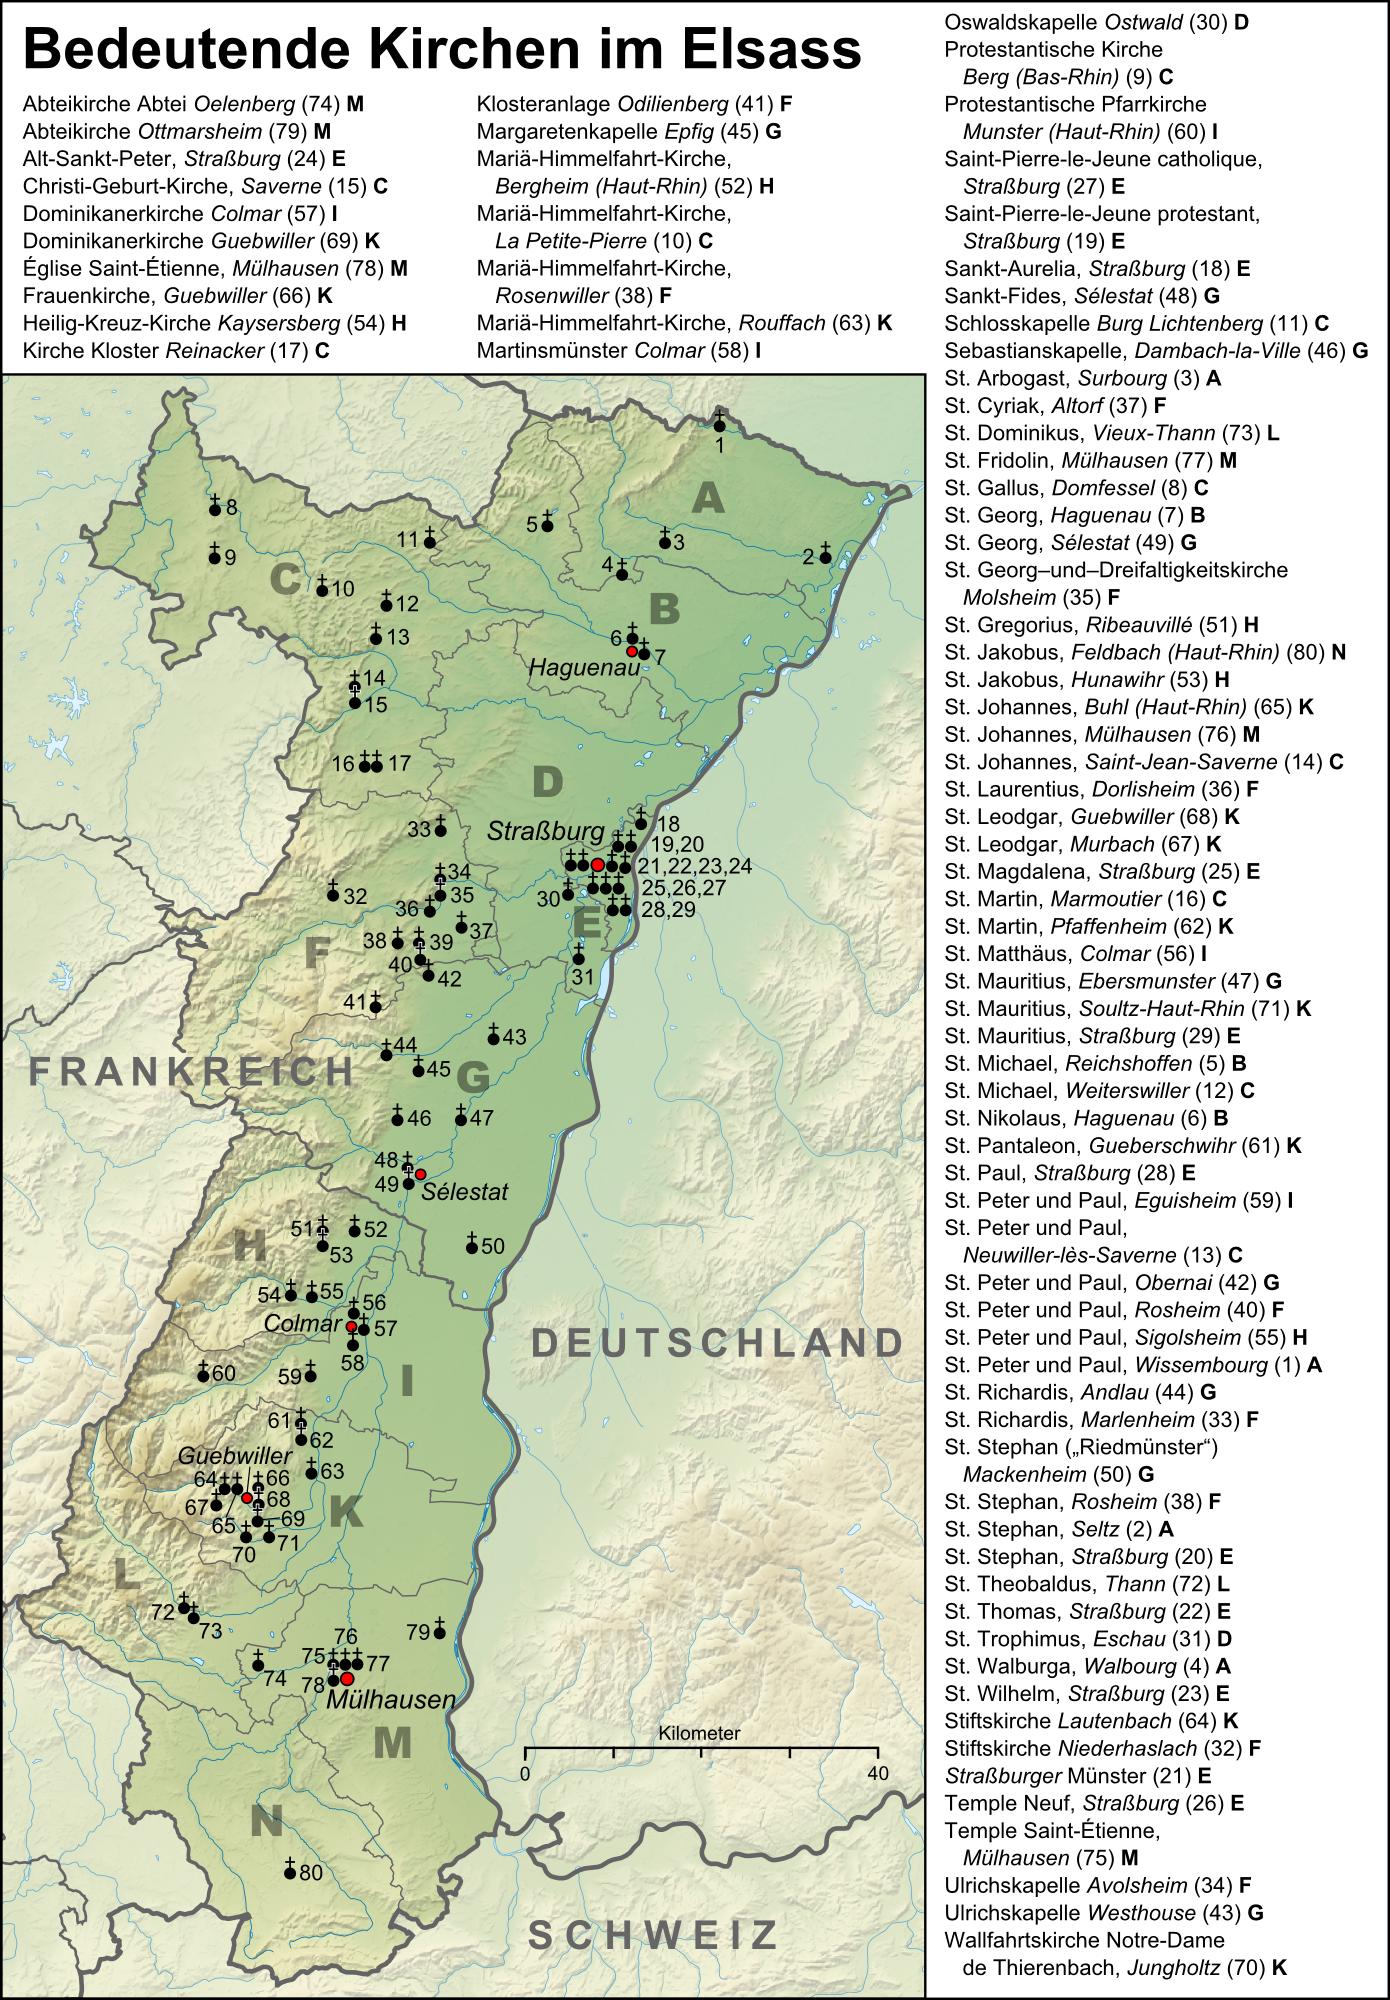 Elsass Auf Karte.Liste Bedeutender Kirchen Im Elsass Wikipedia